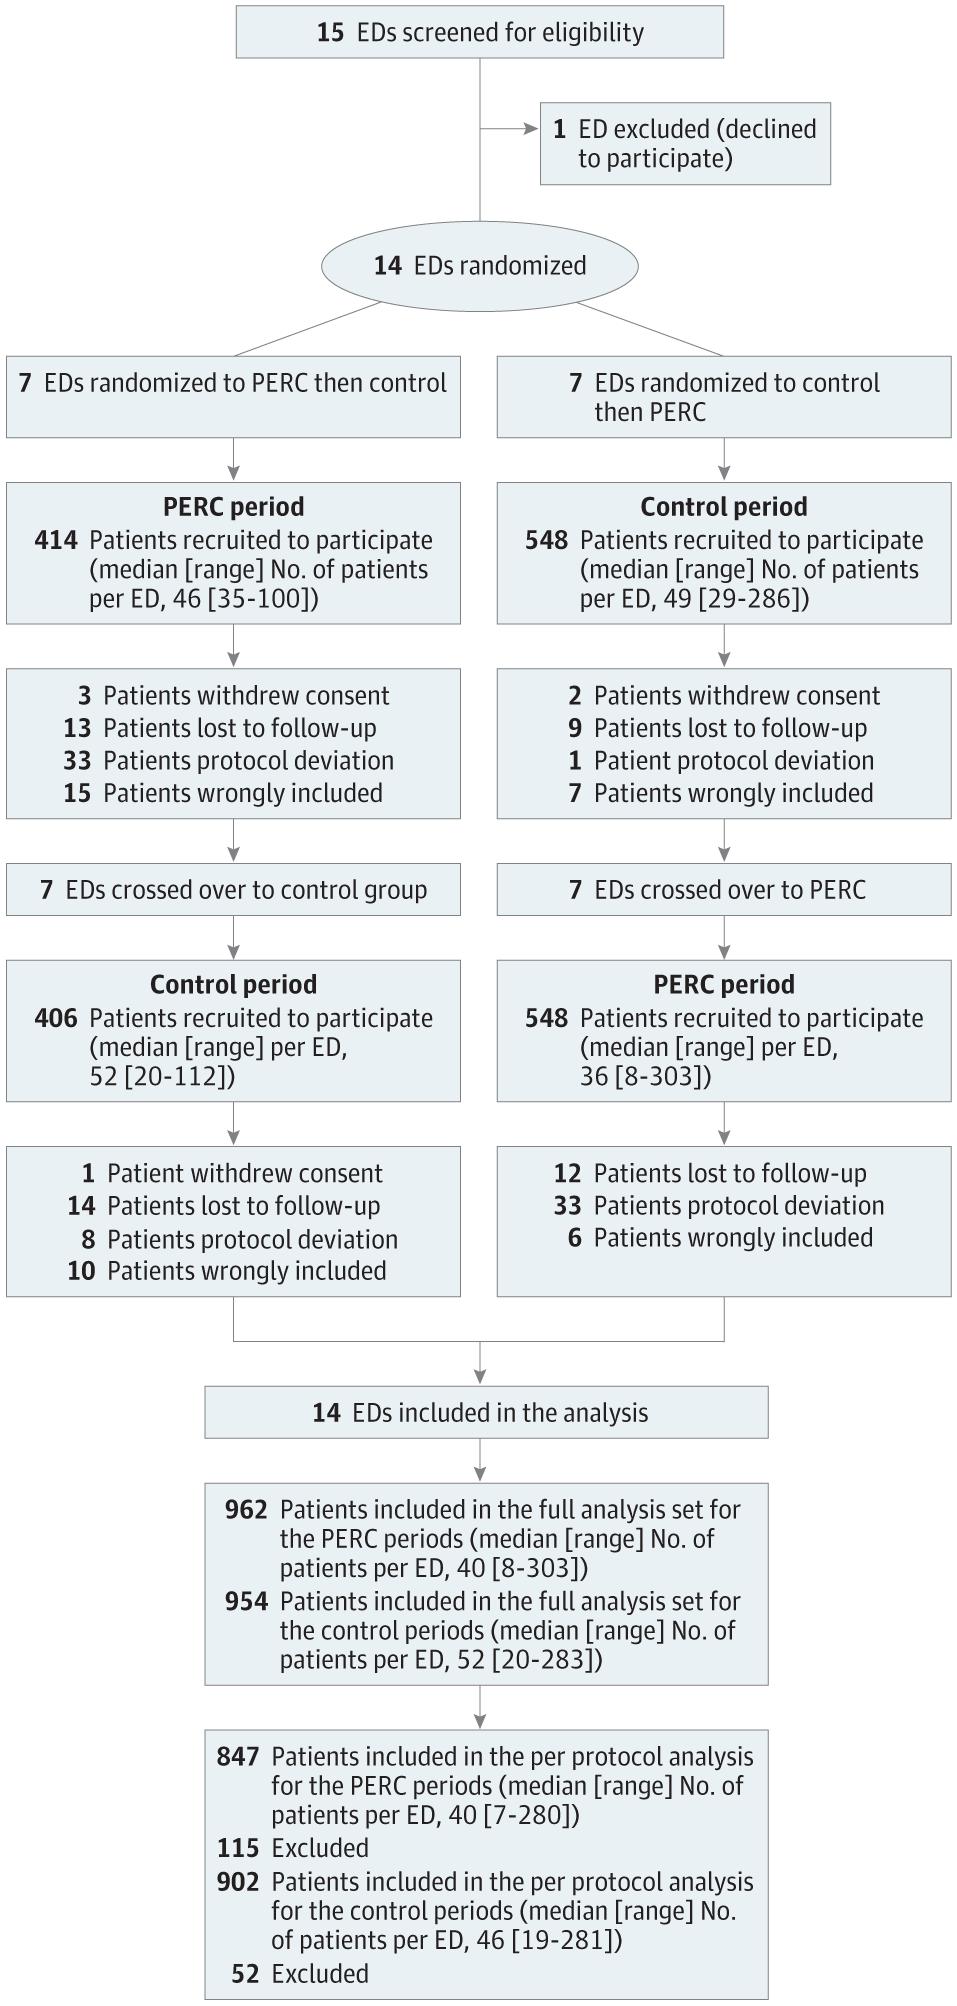 [JAMA发表文章]:PERC有助于极低危患者排除肺栓塞诊断